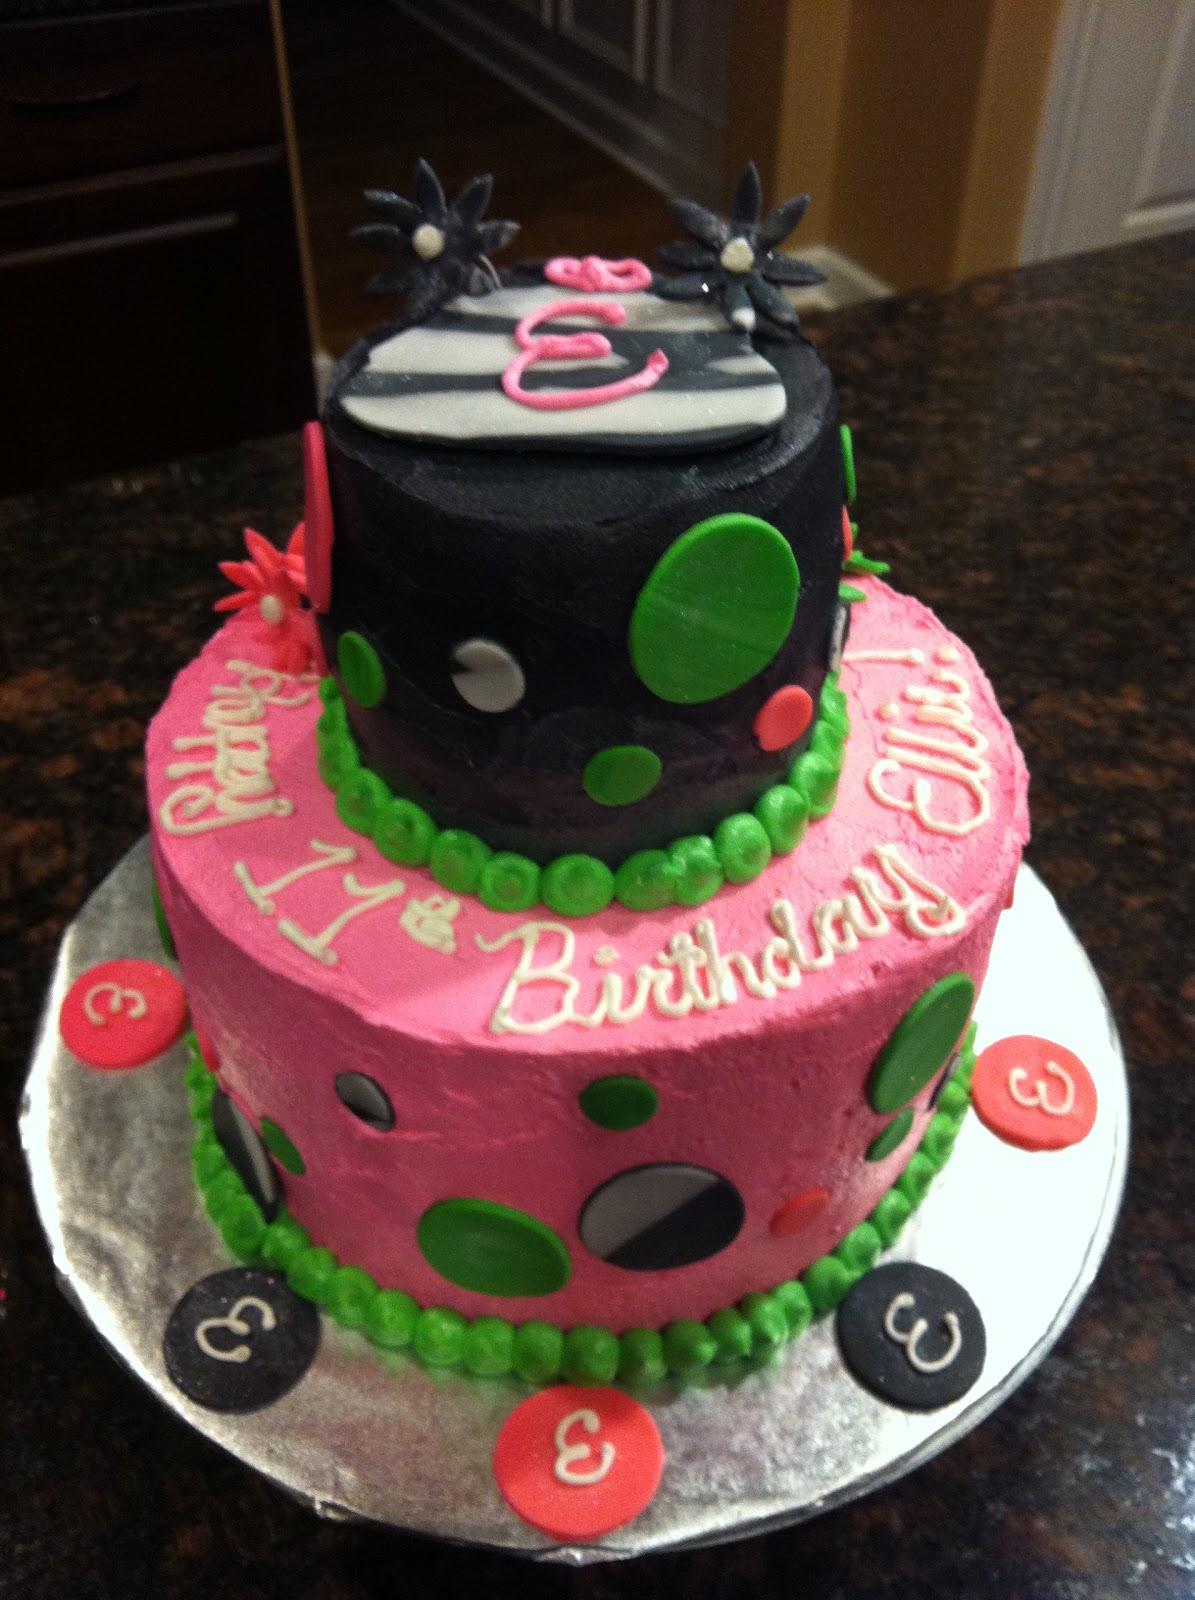 Astounding 6 11 Girls Bday Cakes Photo Birthday Cake 11 Year Old Birthday Funny Birthday Cards Online Elaedamsfinfo